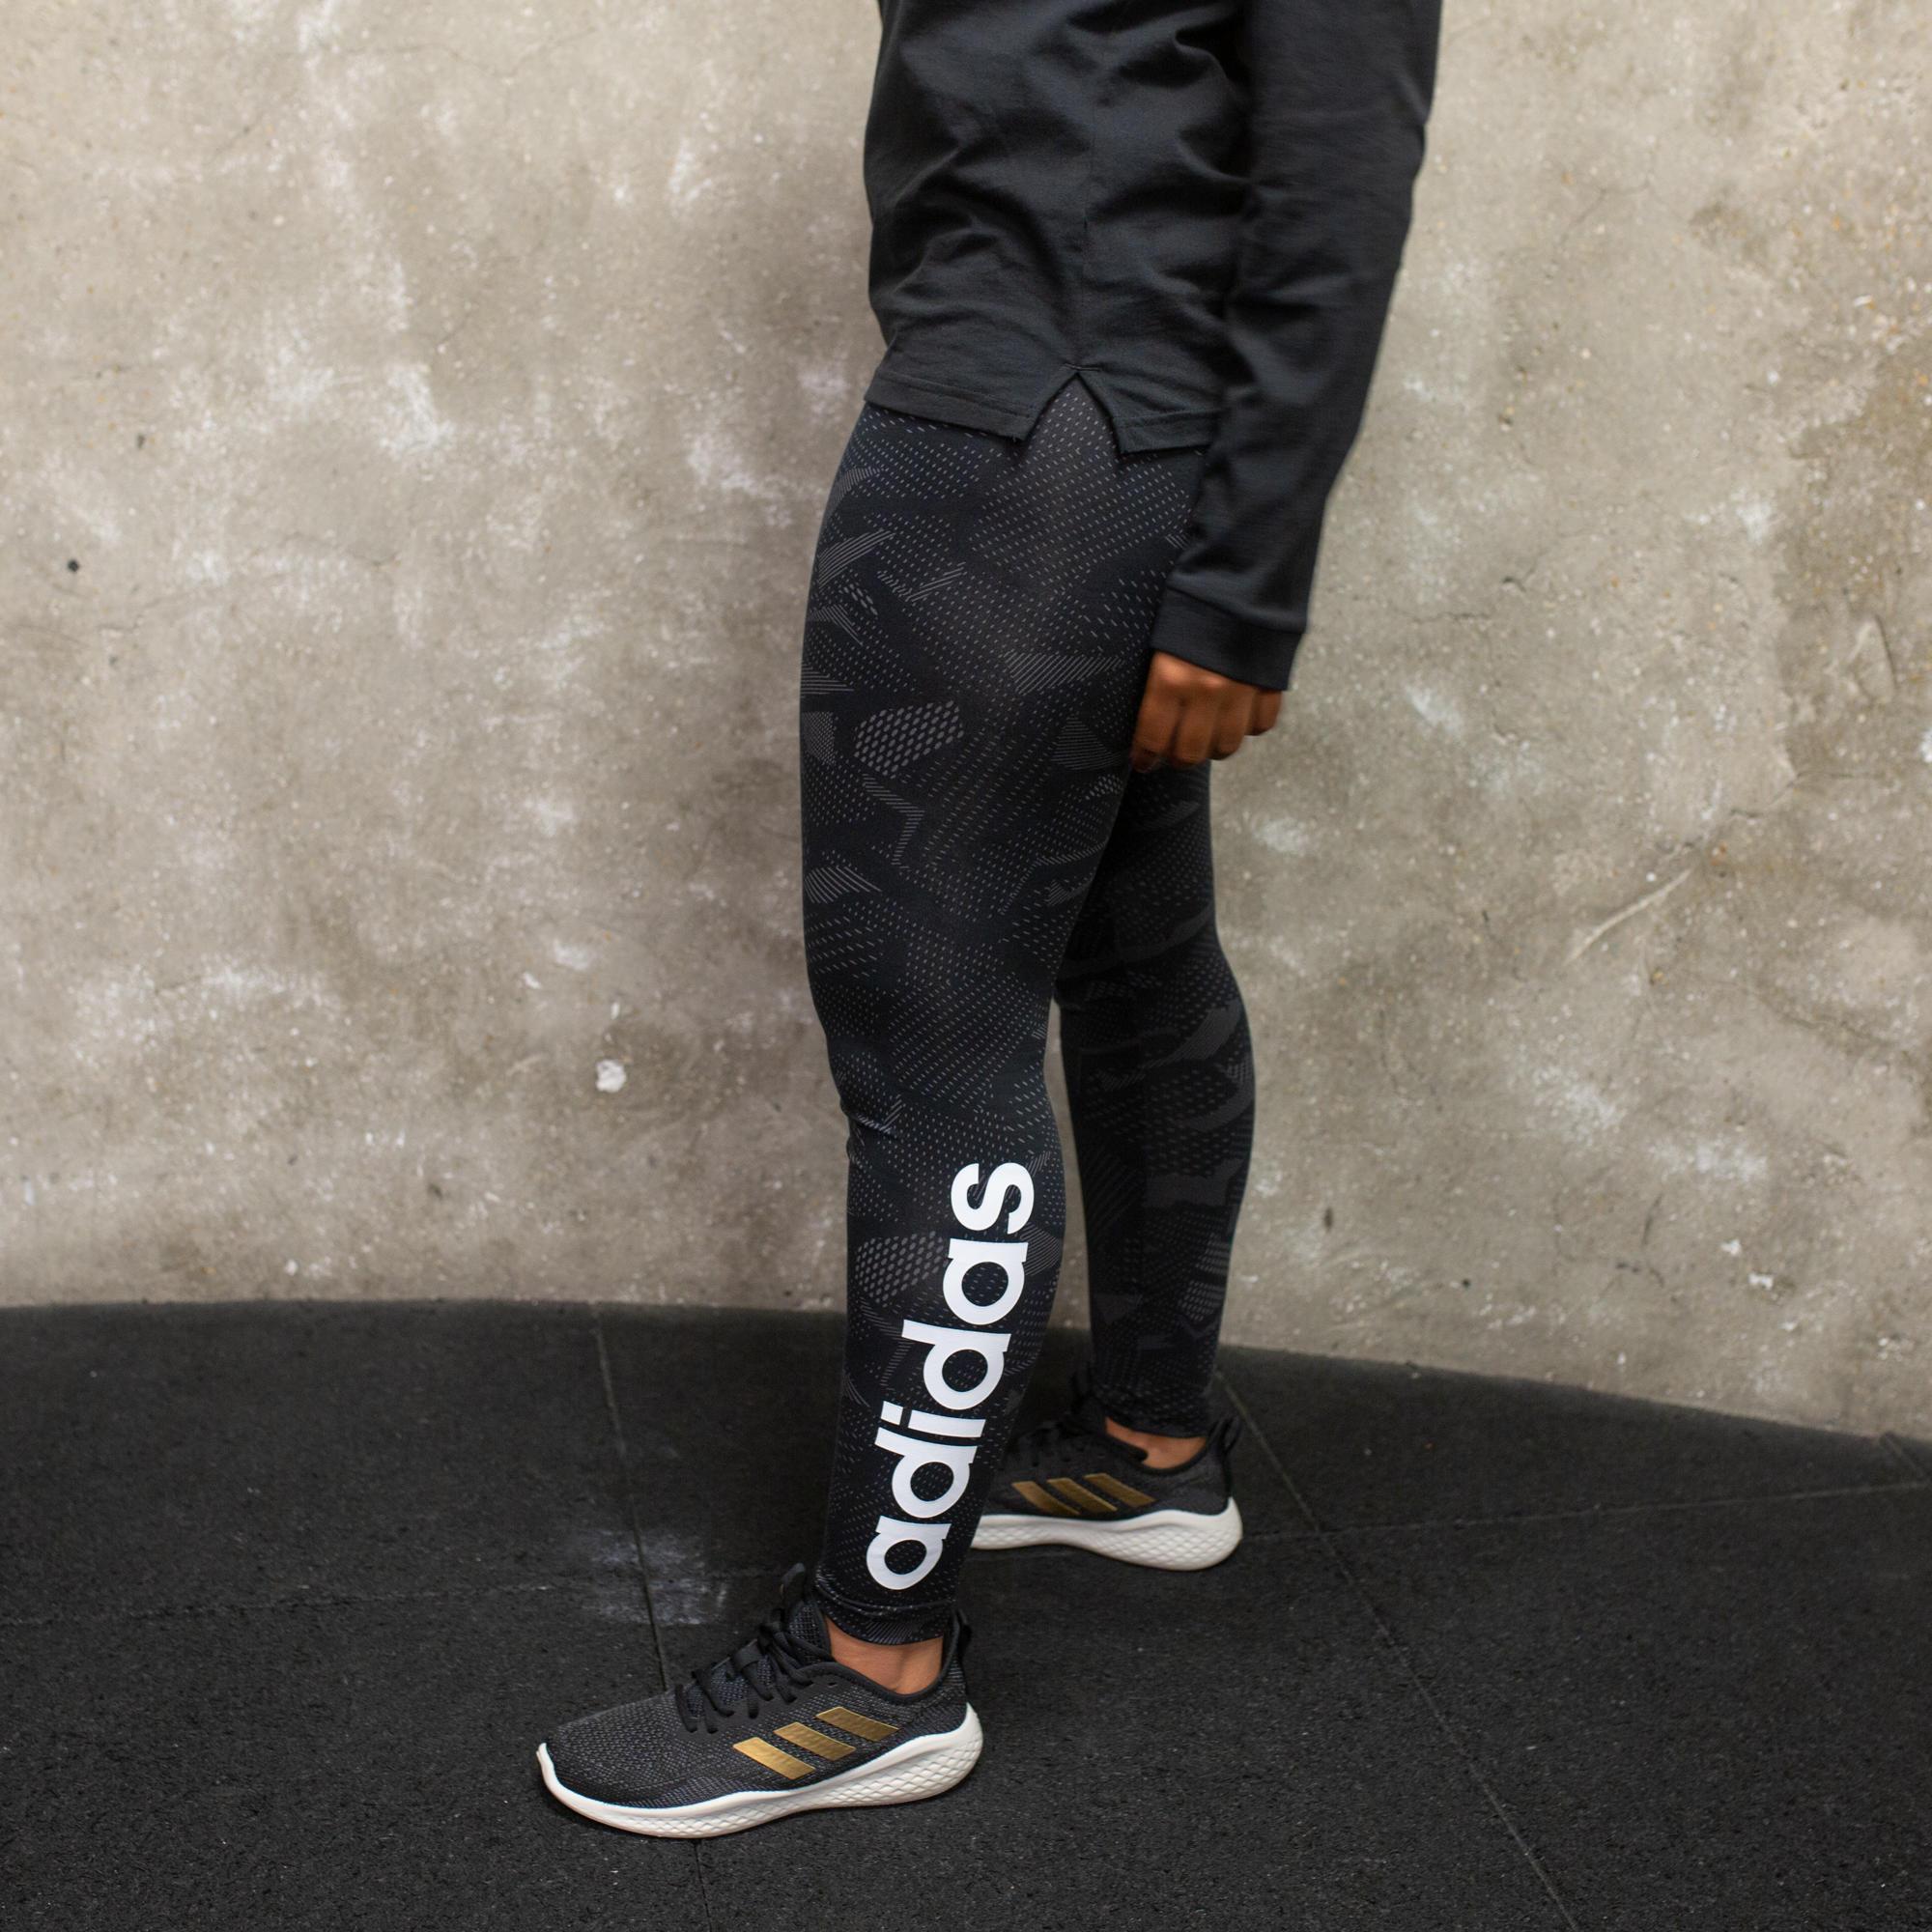 Women's Leggings - Black with Print